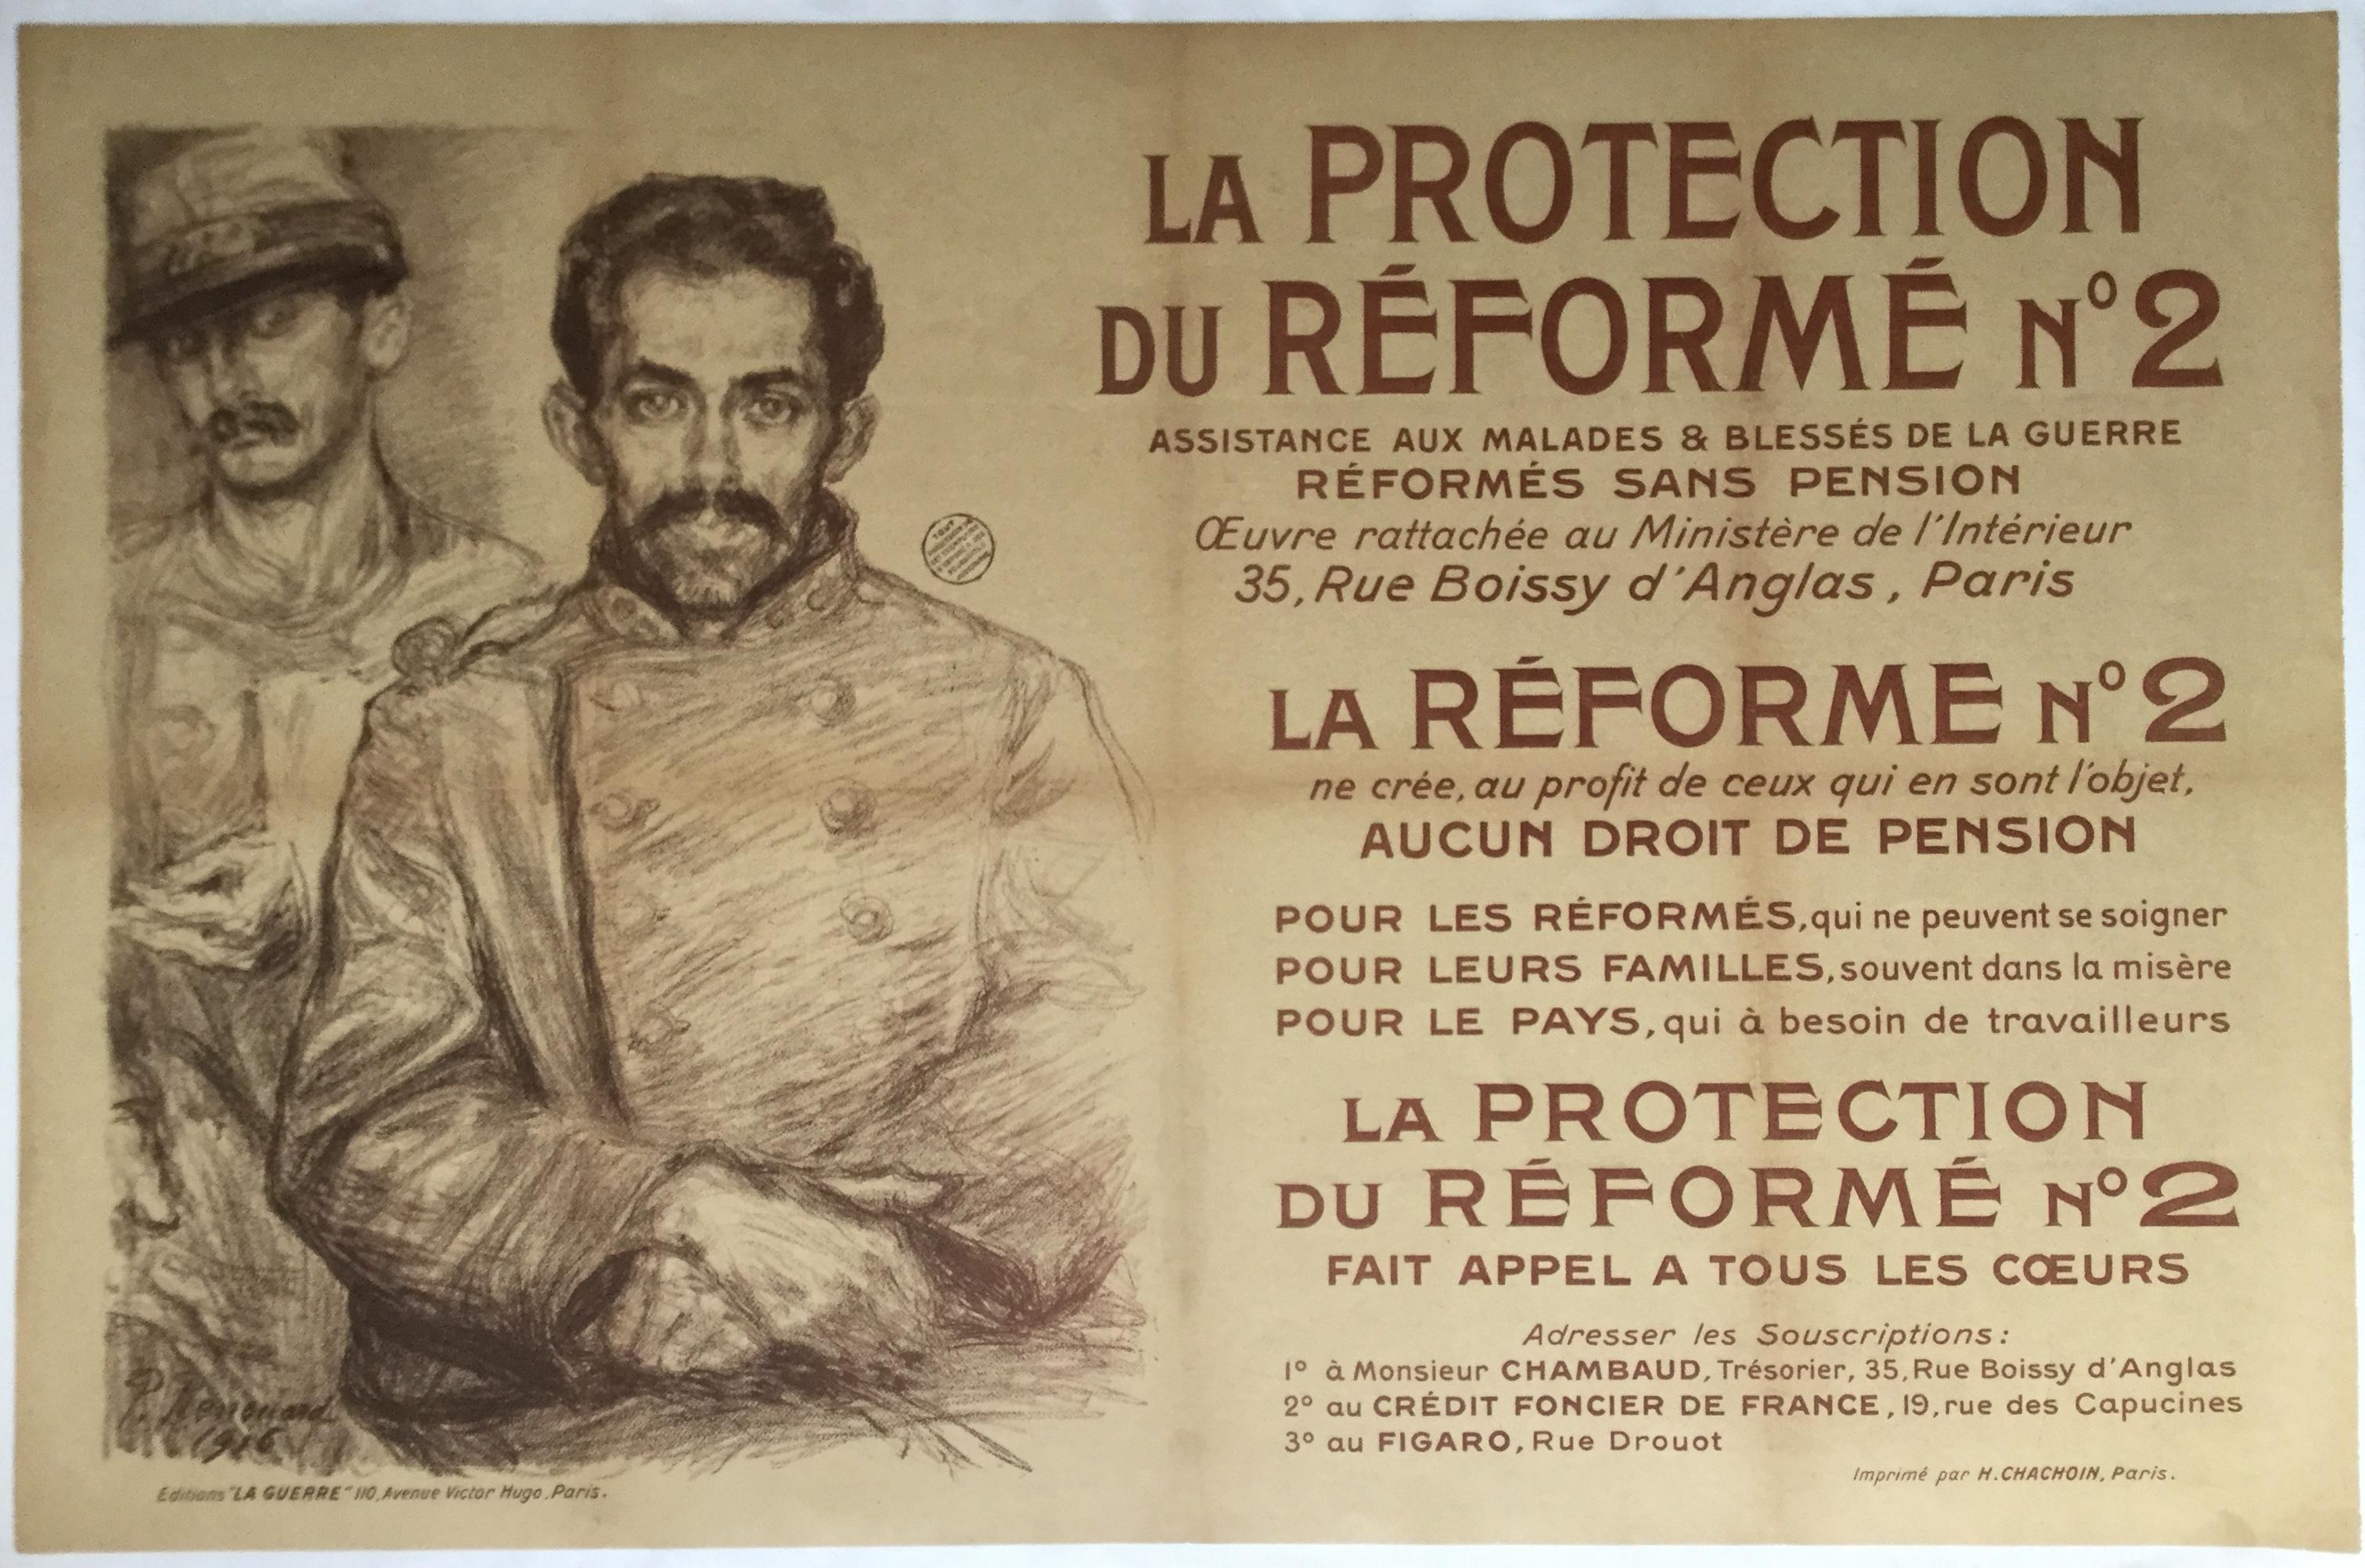 WW749LA PROTECTION DU REFORME NO. 2